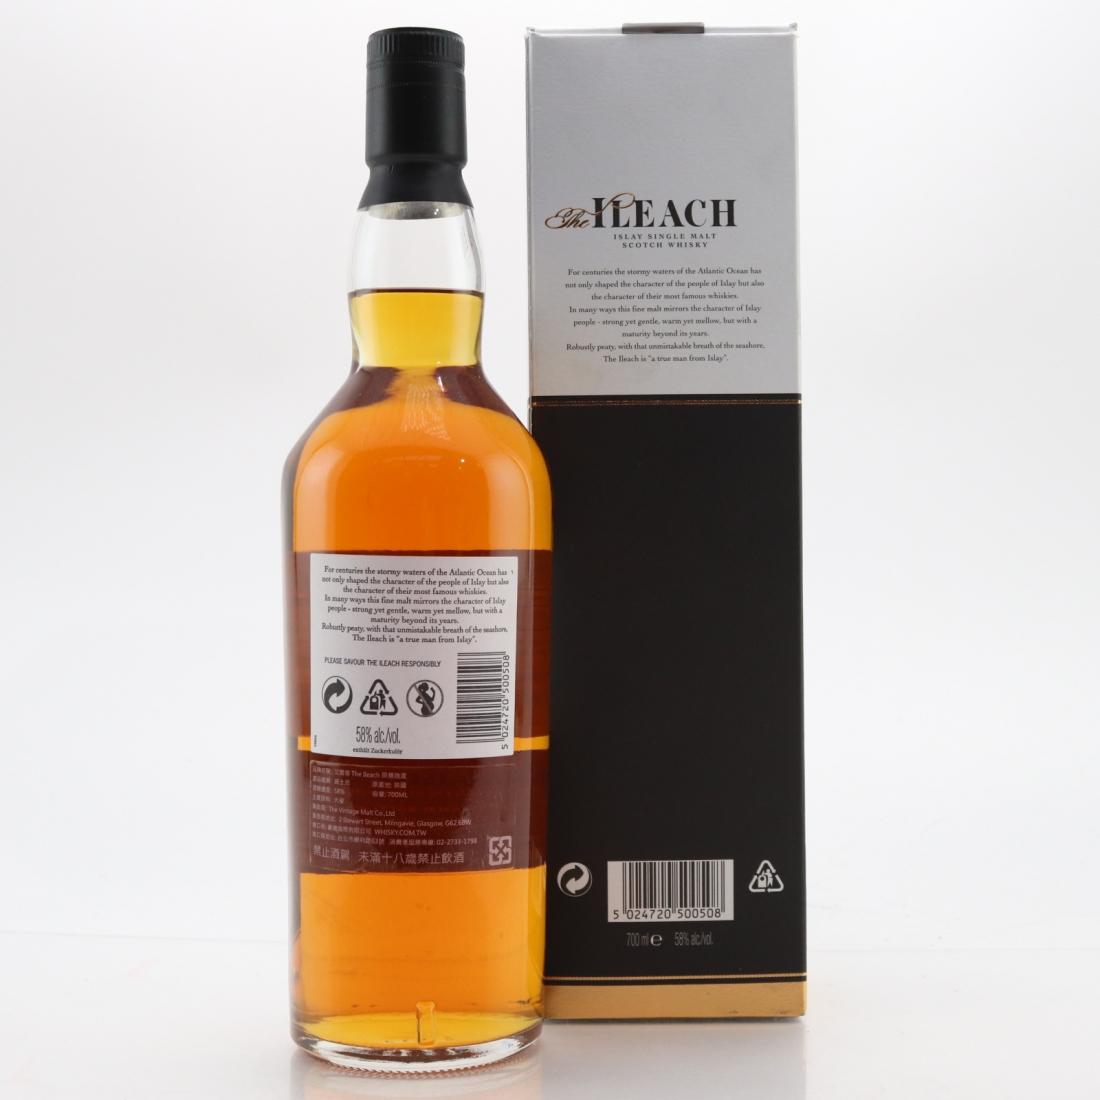 Ileach Cask Strength Islay Single Malt